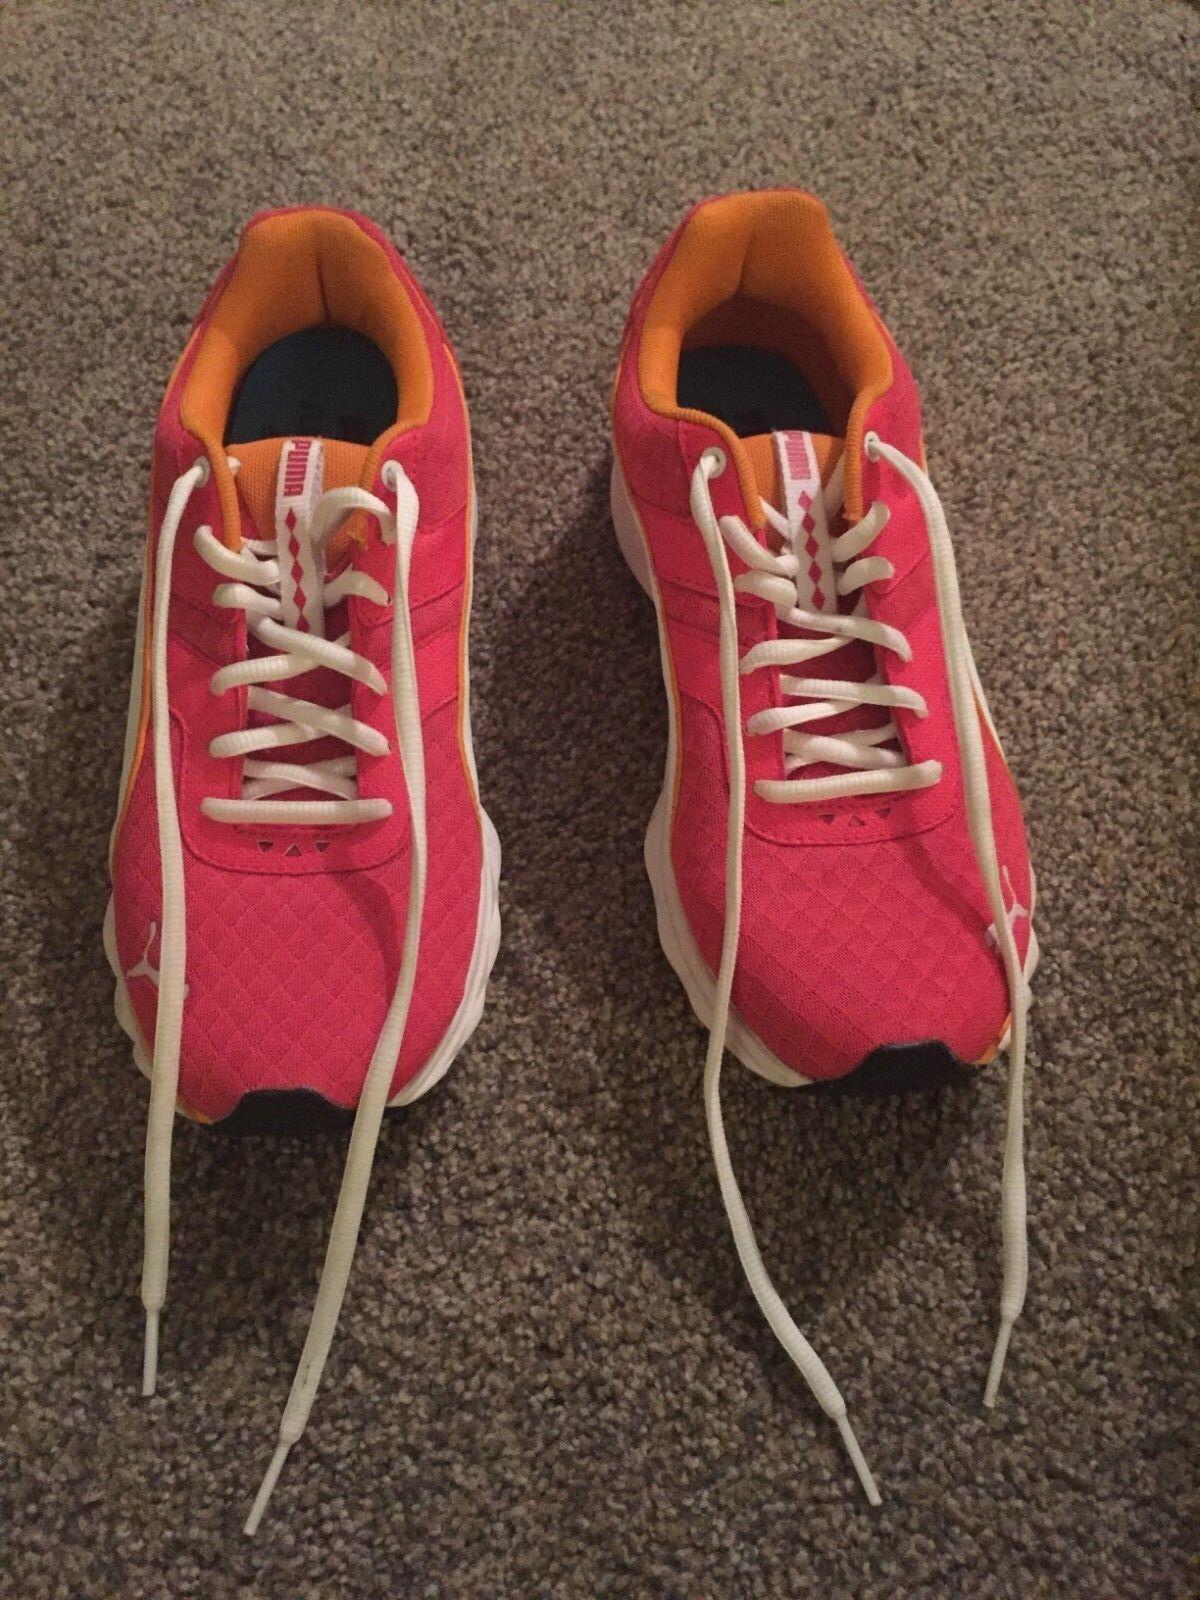 Puma Women's Sport Lifestyle Running EcoOrthoLite Sneakers Size 7.5 EUC